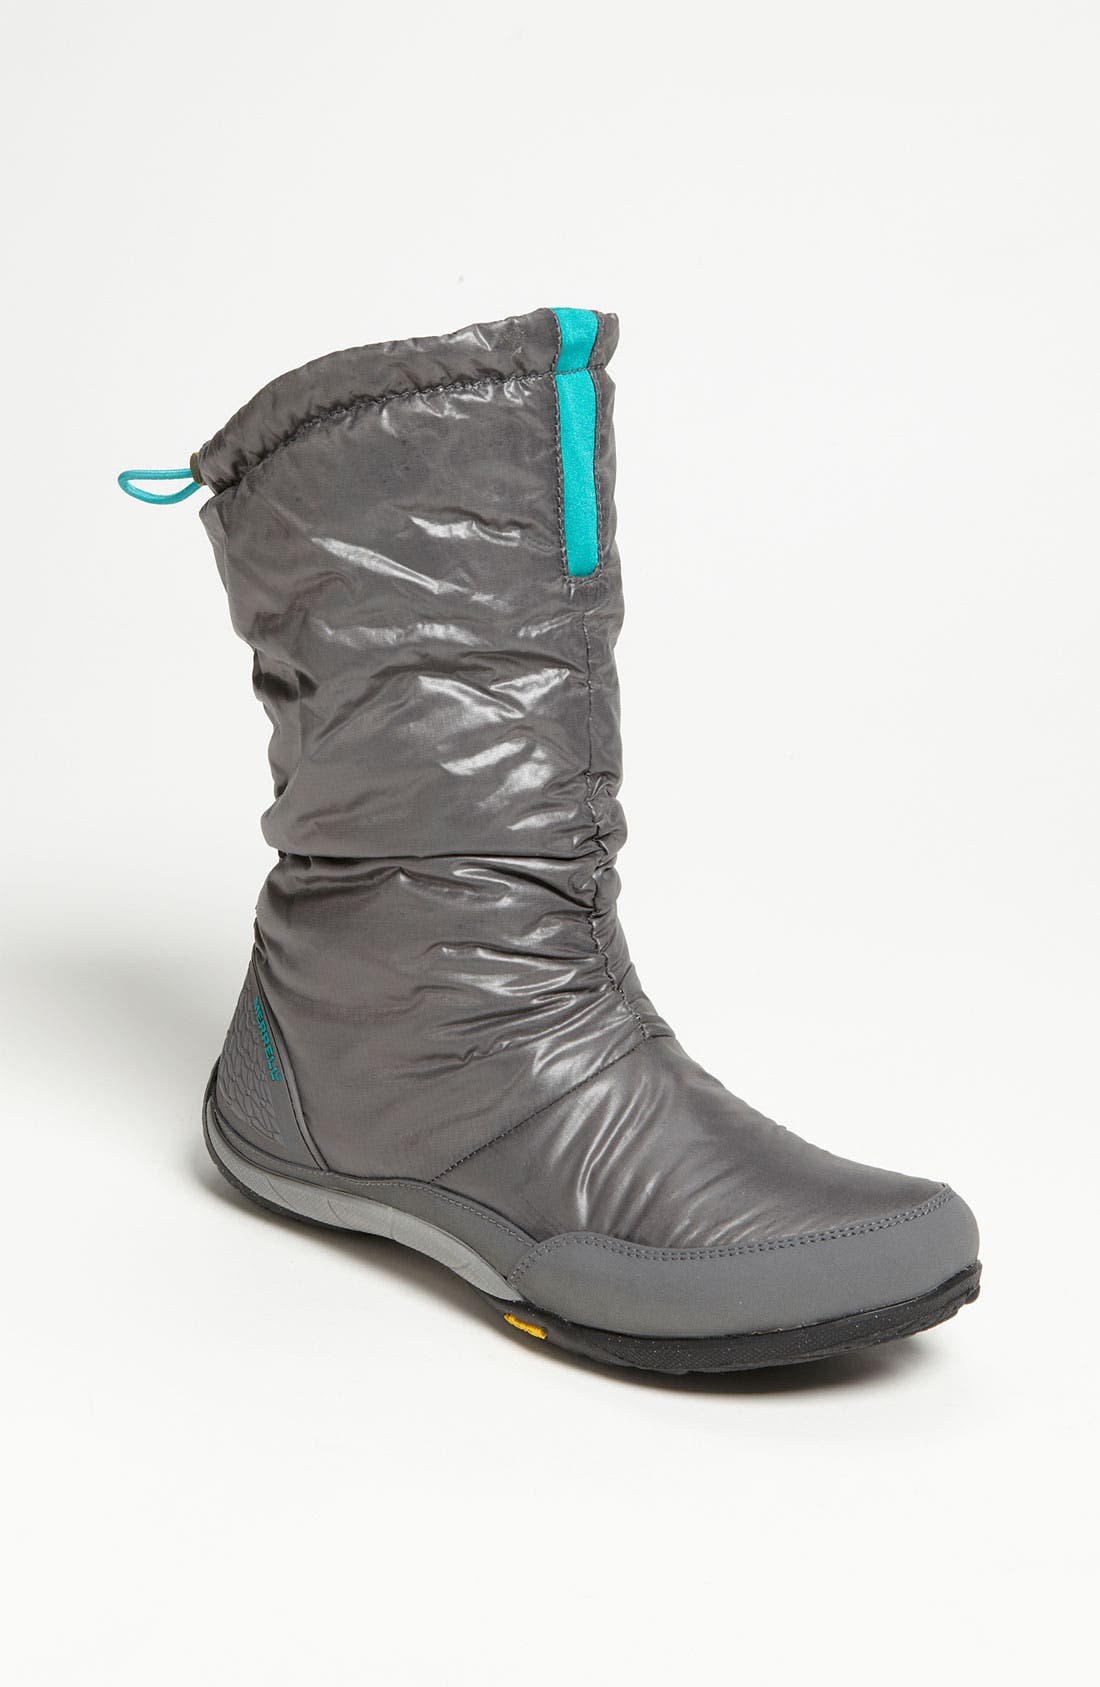 Main Image - Merrell 'Frost Glove' Boot